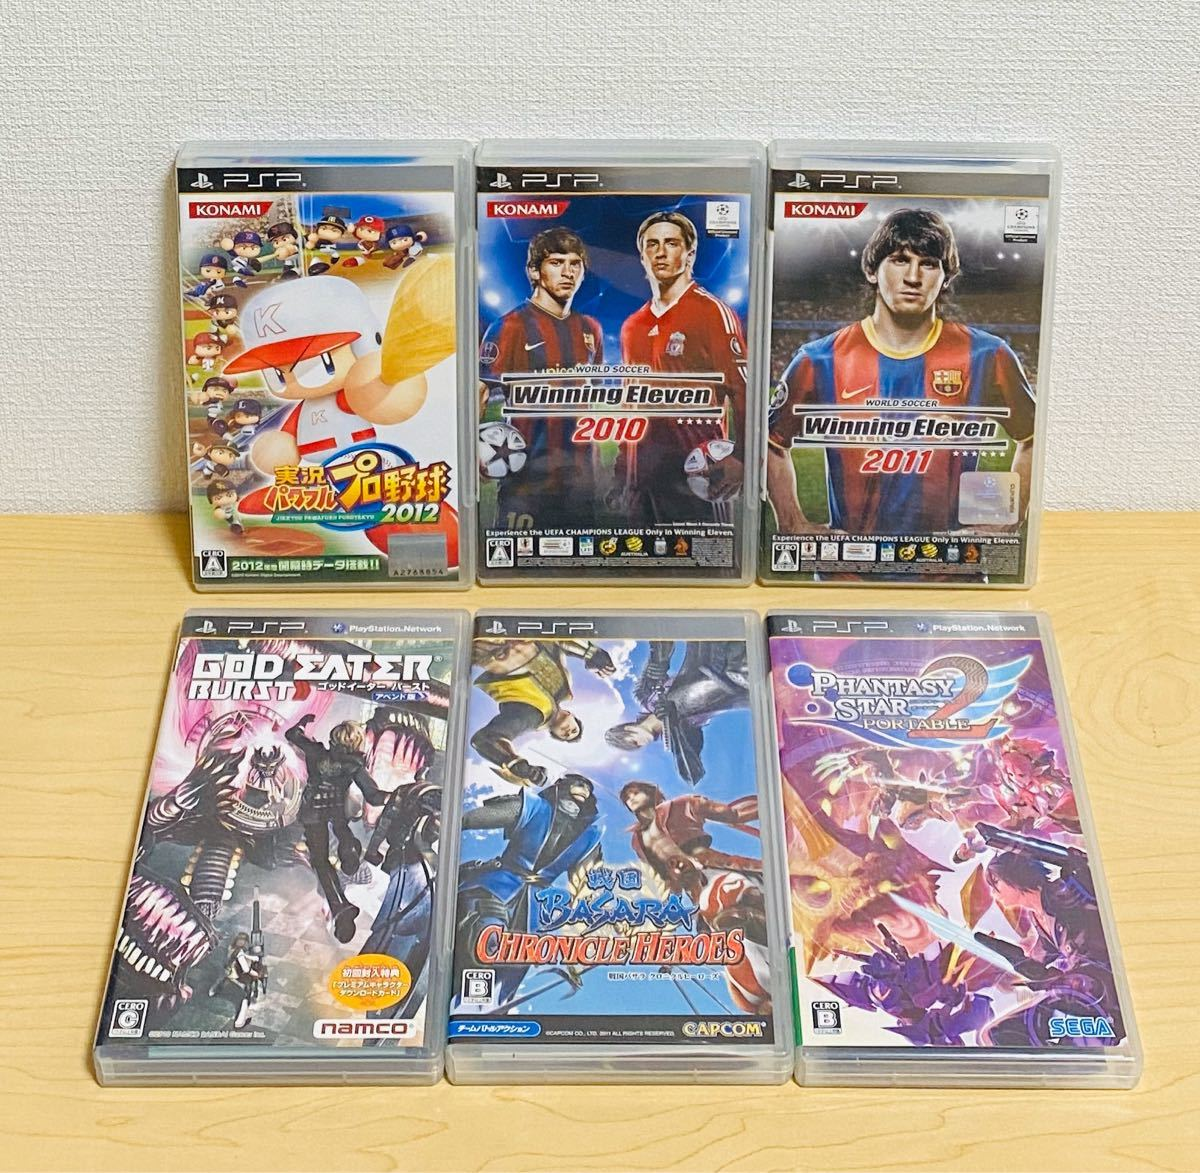 PSP ソフト 12本 SONY プレーステーションポータブル 中古 まとめ 6